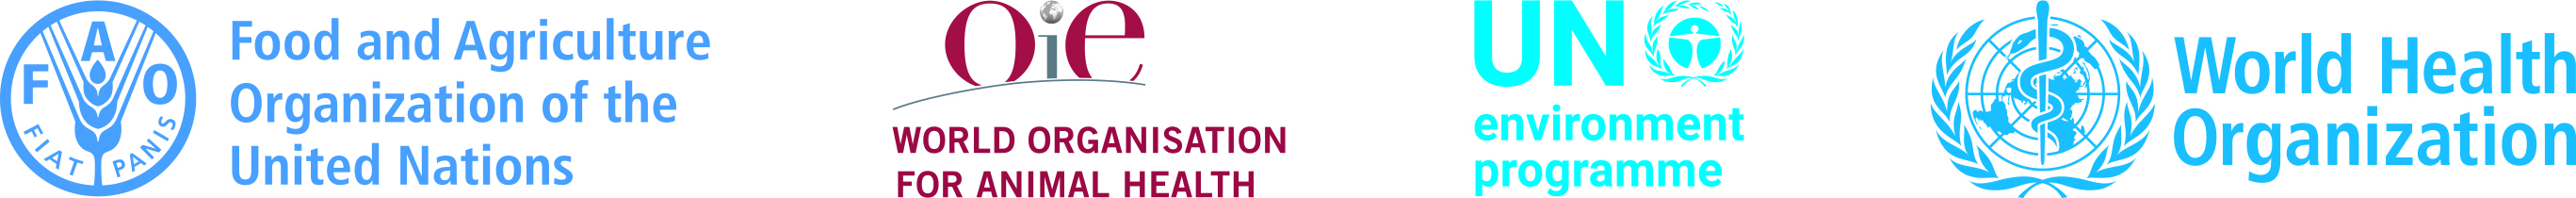 One Health High Level Expert Panel (OHHLEP) Partners logo